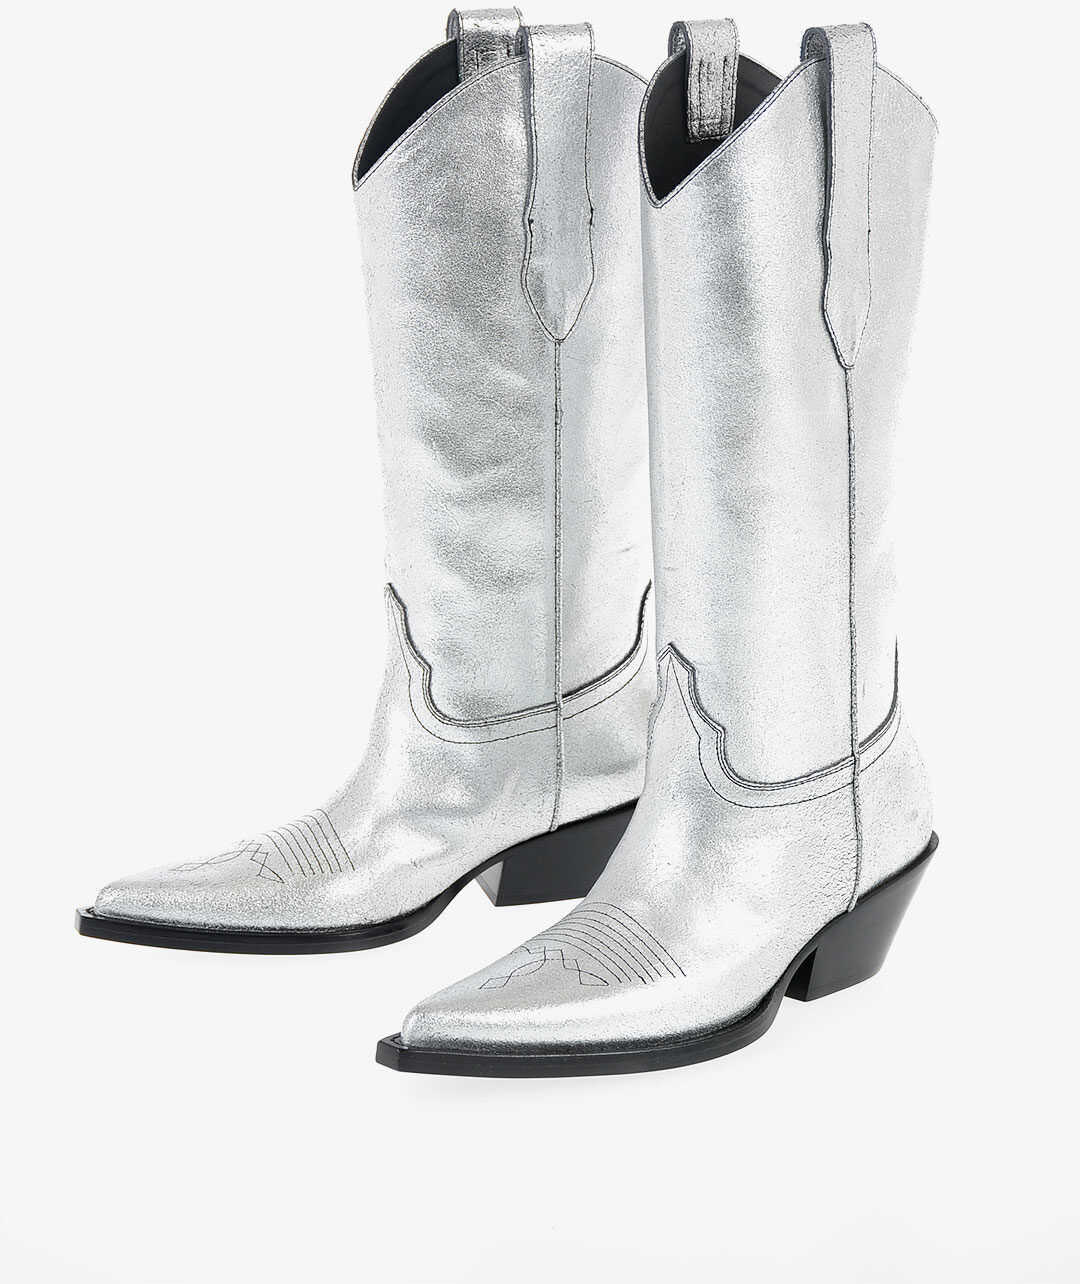 Maison Margiela MM22 metallic Leather Texan Boots SILVER imagine b-mall.ro